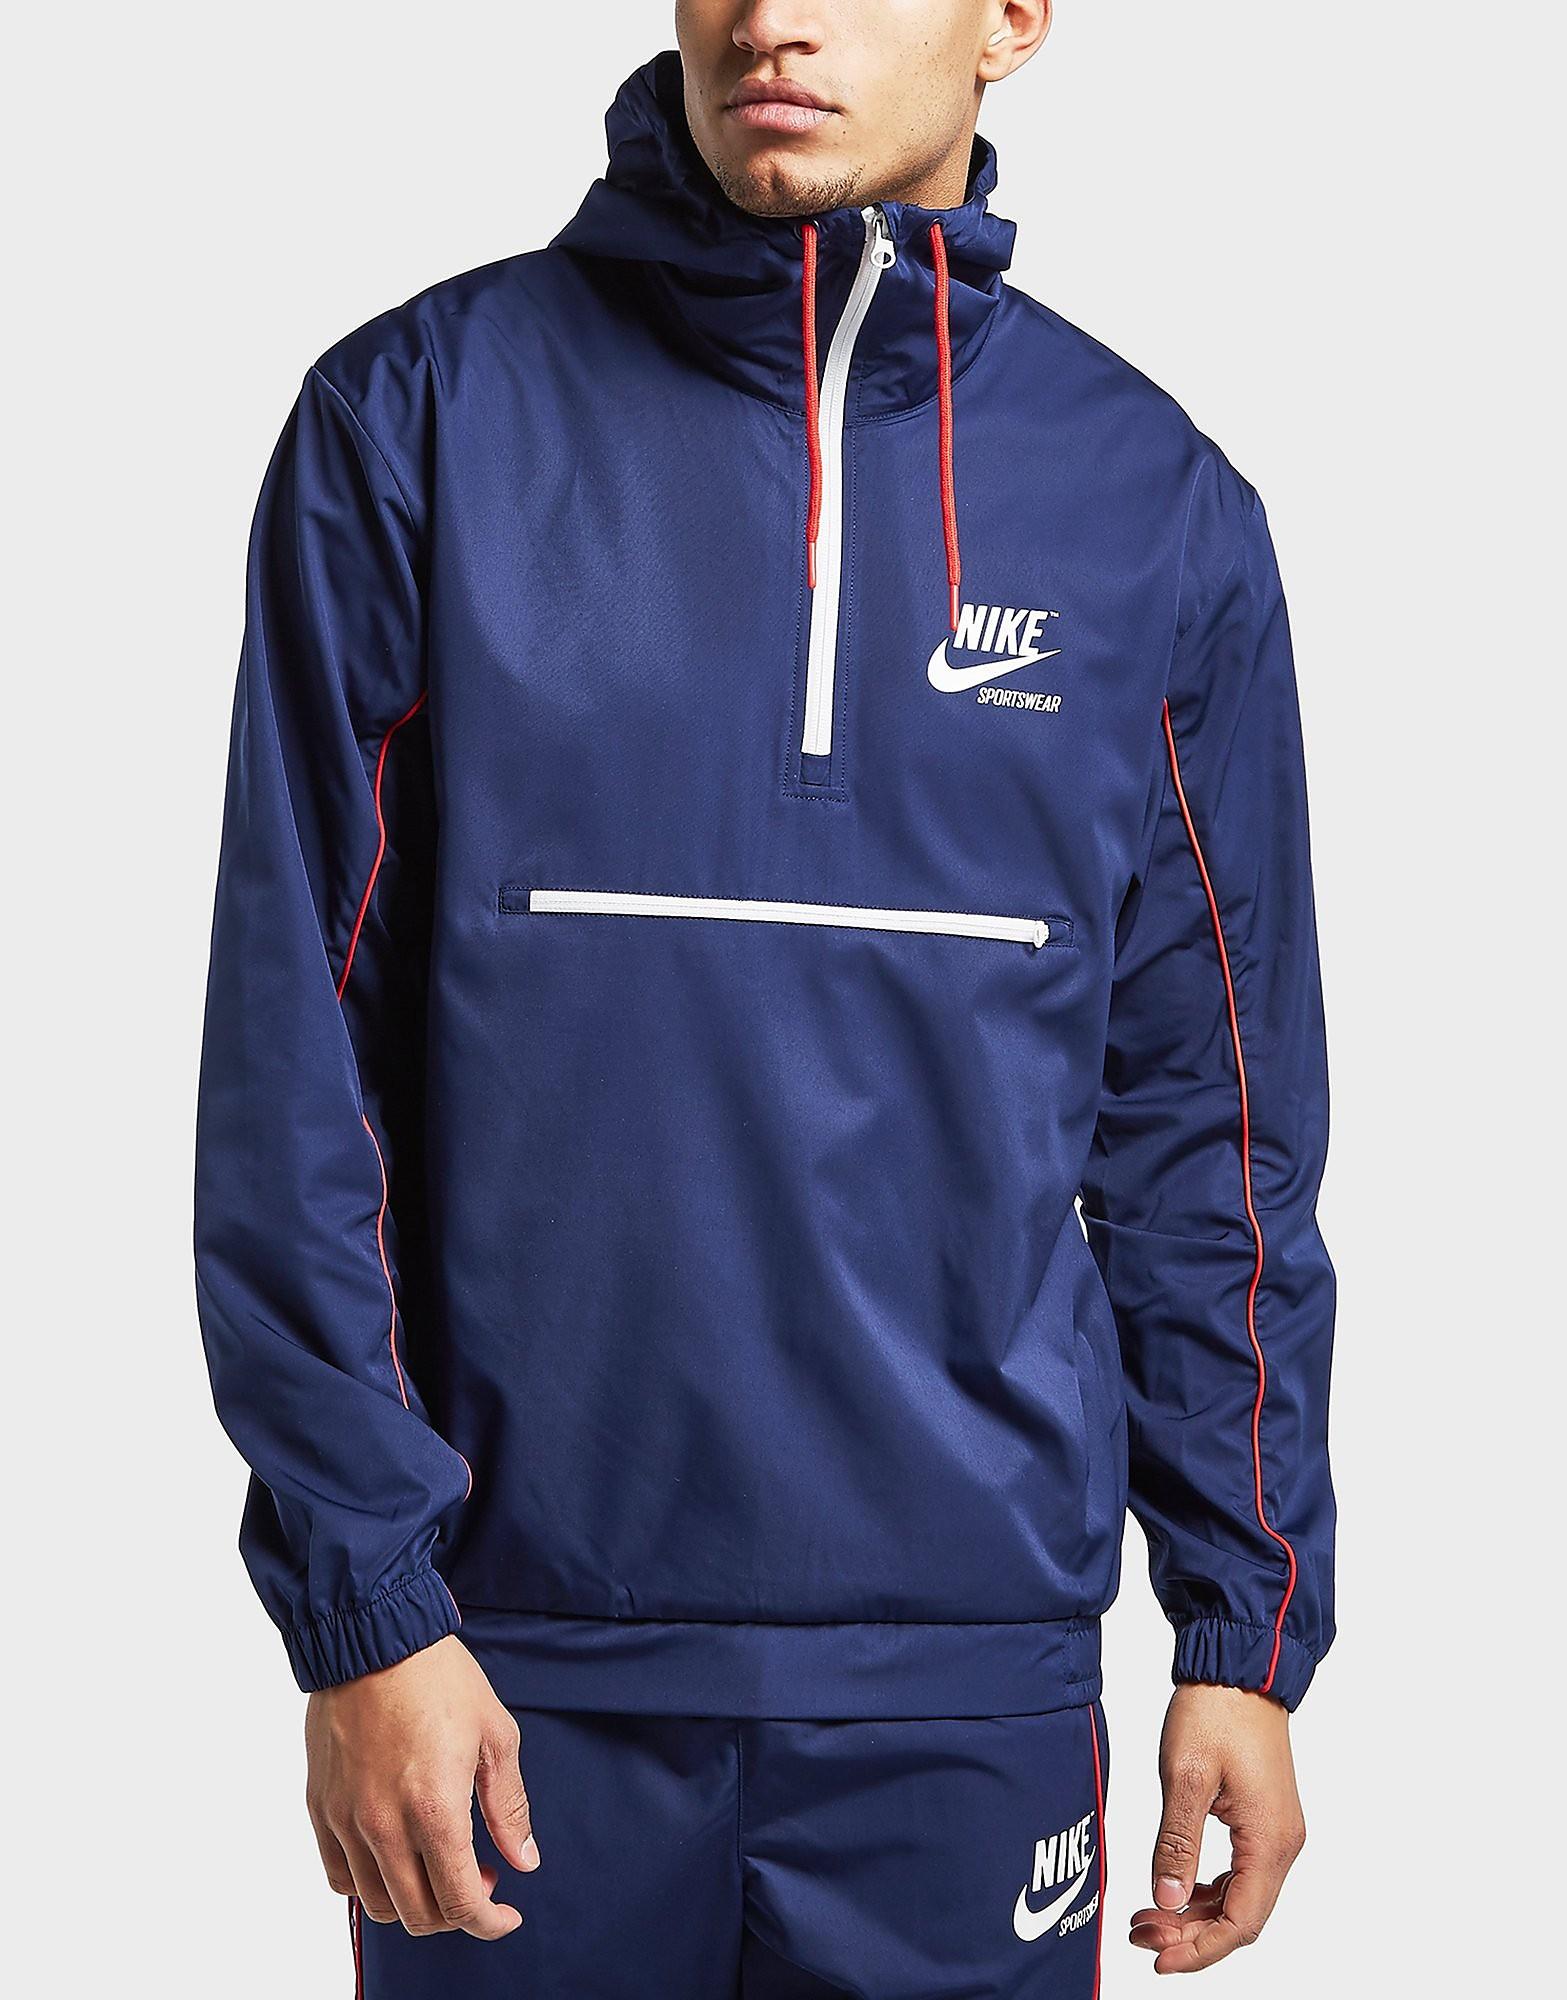 Nike Archive Woven Half Zip Jacket